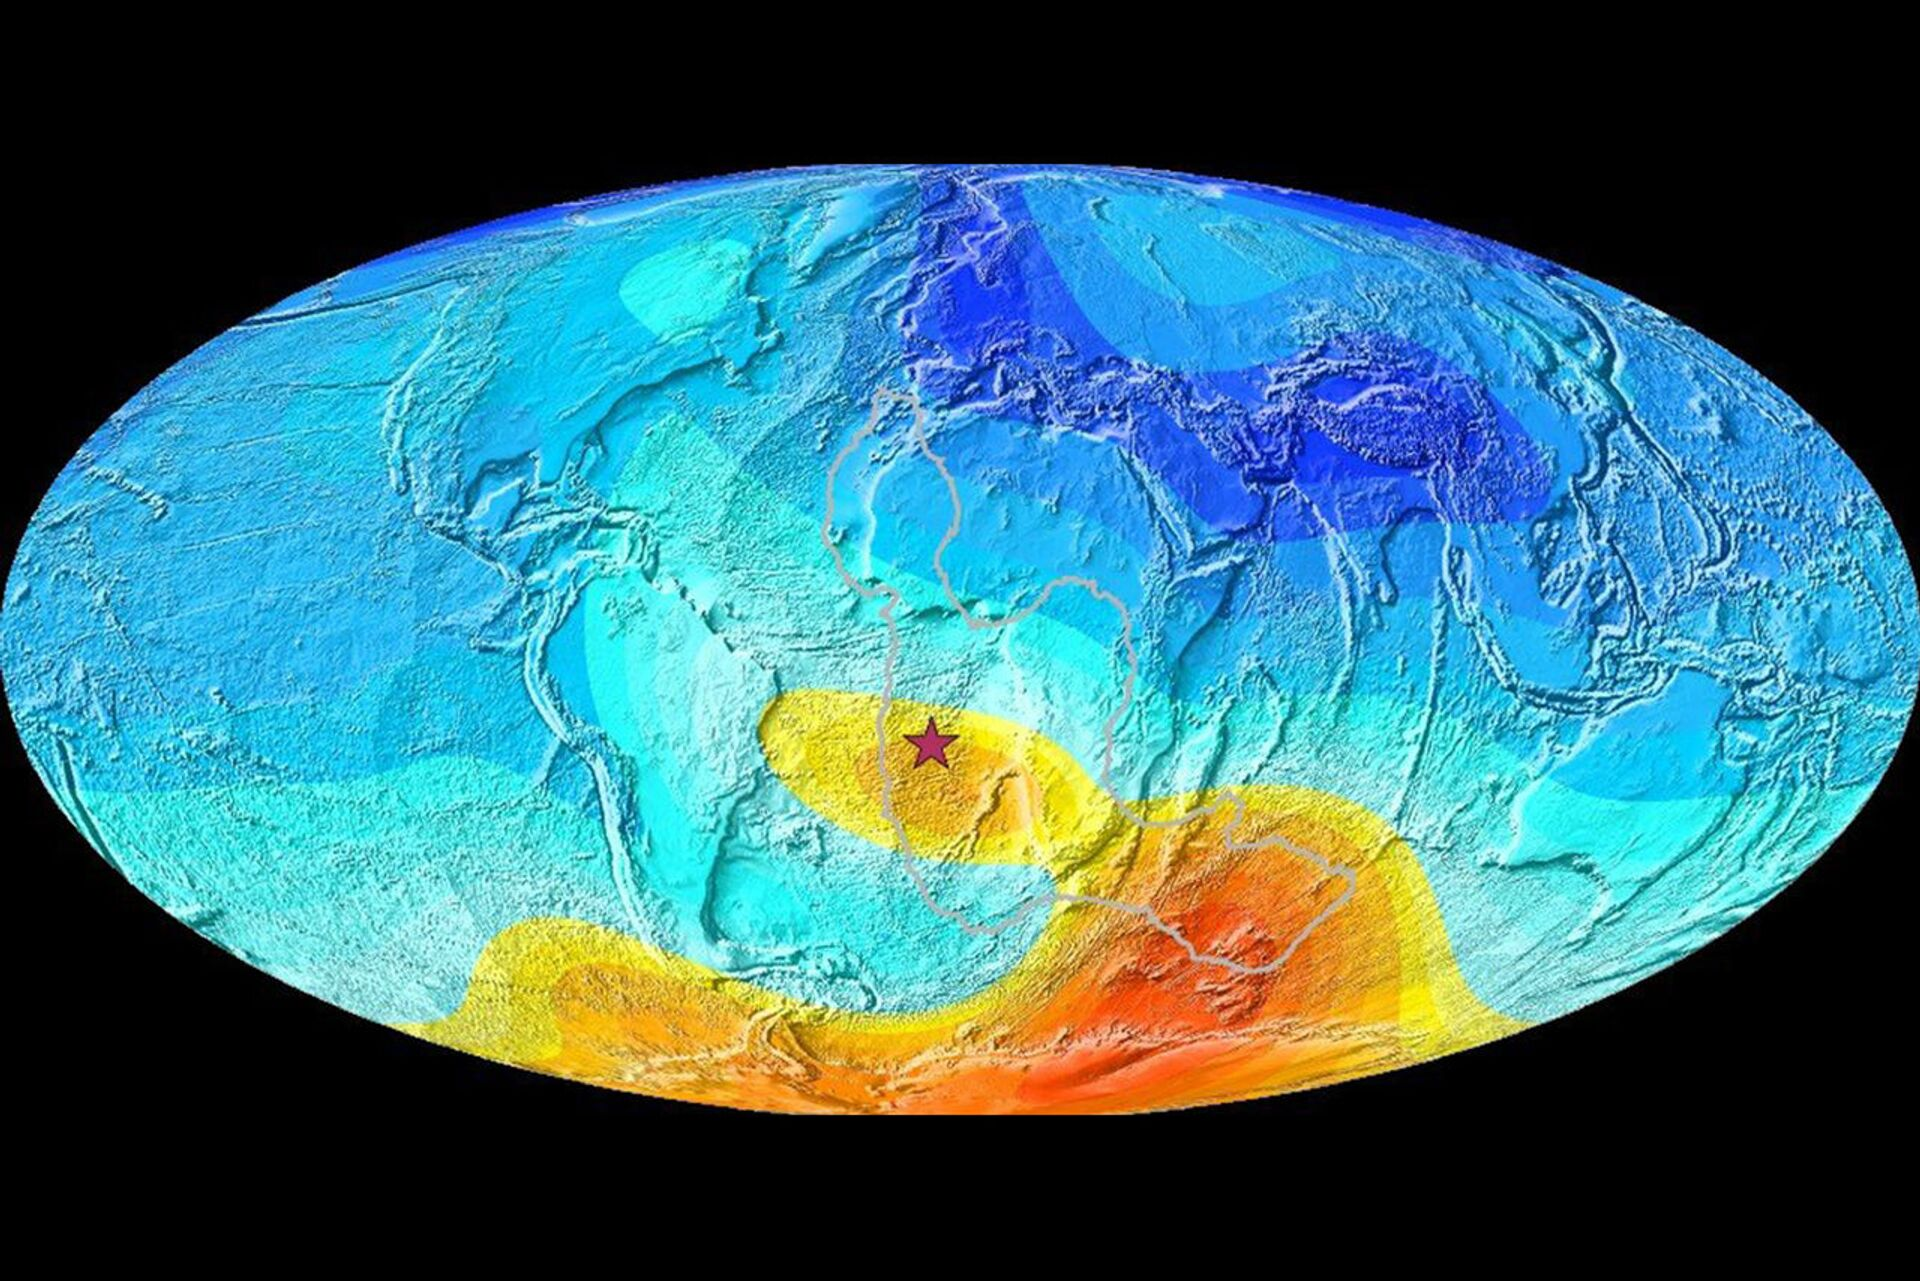 Catastrofe magnetica: inversione poli terrestri - Sputnik Italia, 1920, 28.03.2021